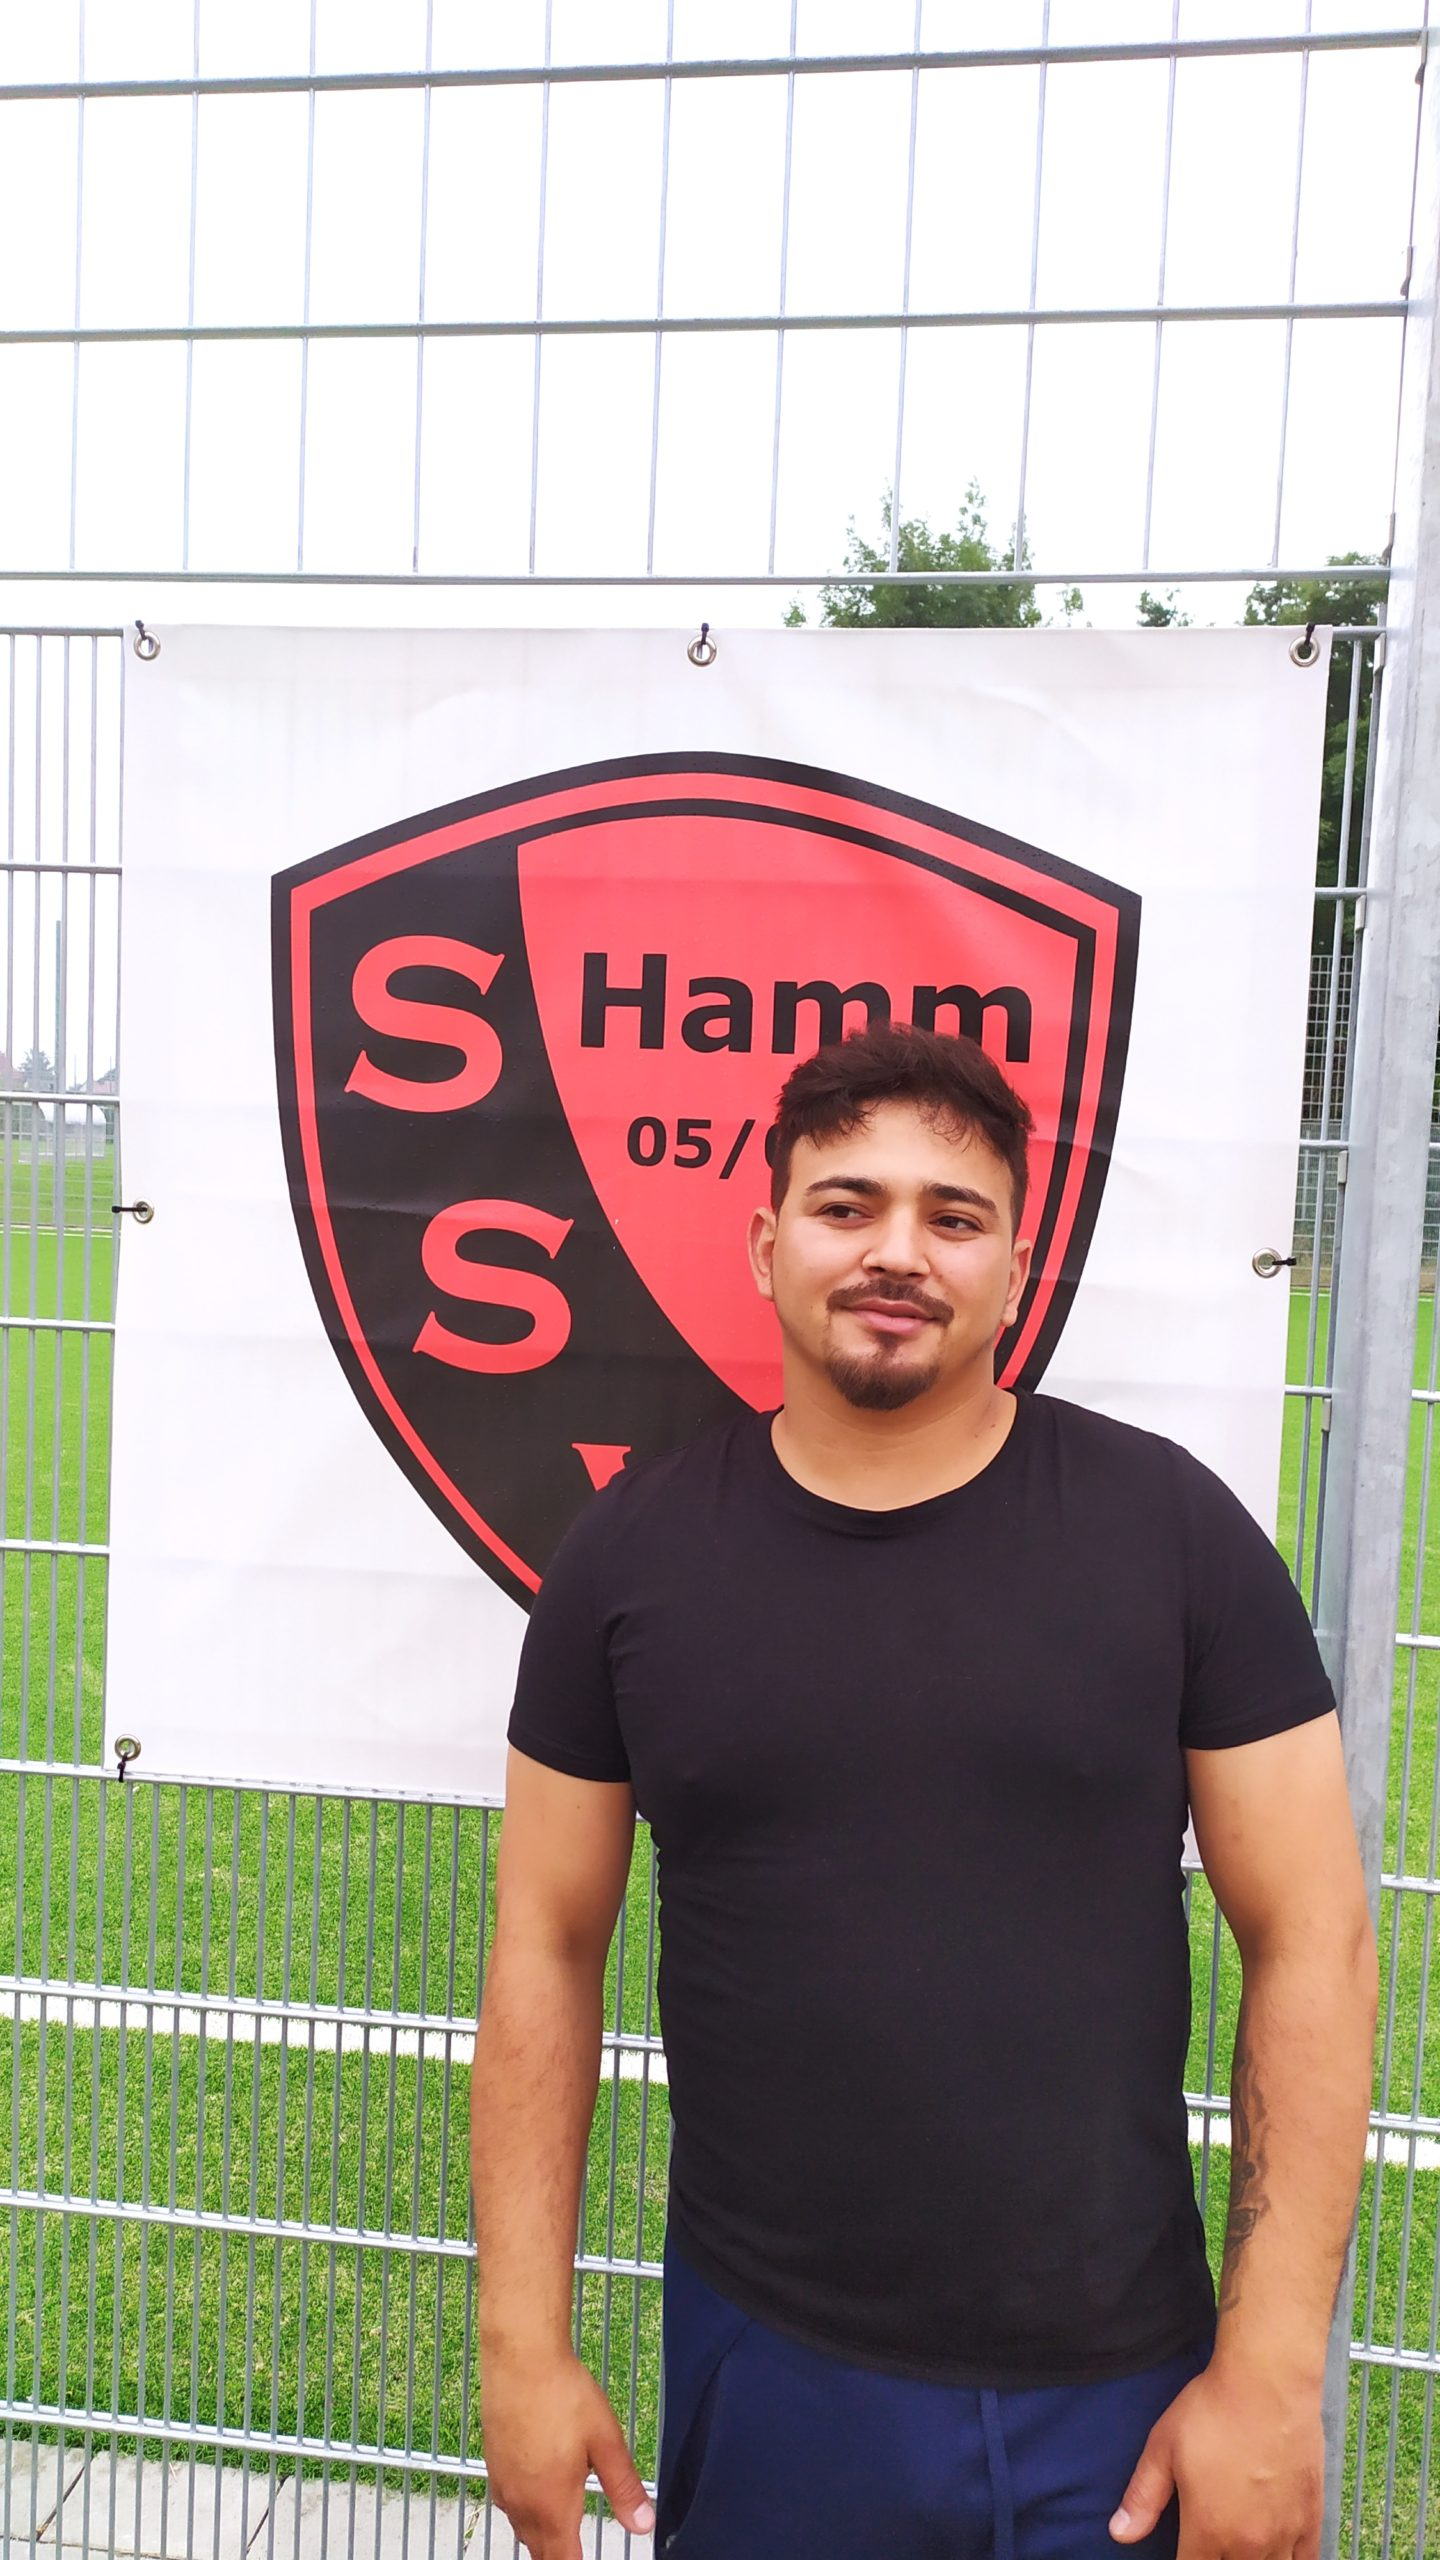 Read more about the article Ferhat Ertuğrul als neuer Abteilungsleiter Jugend-Fußball im SSV Hamm